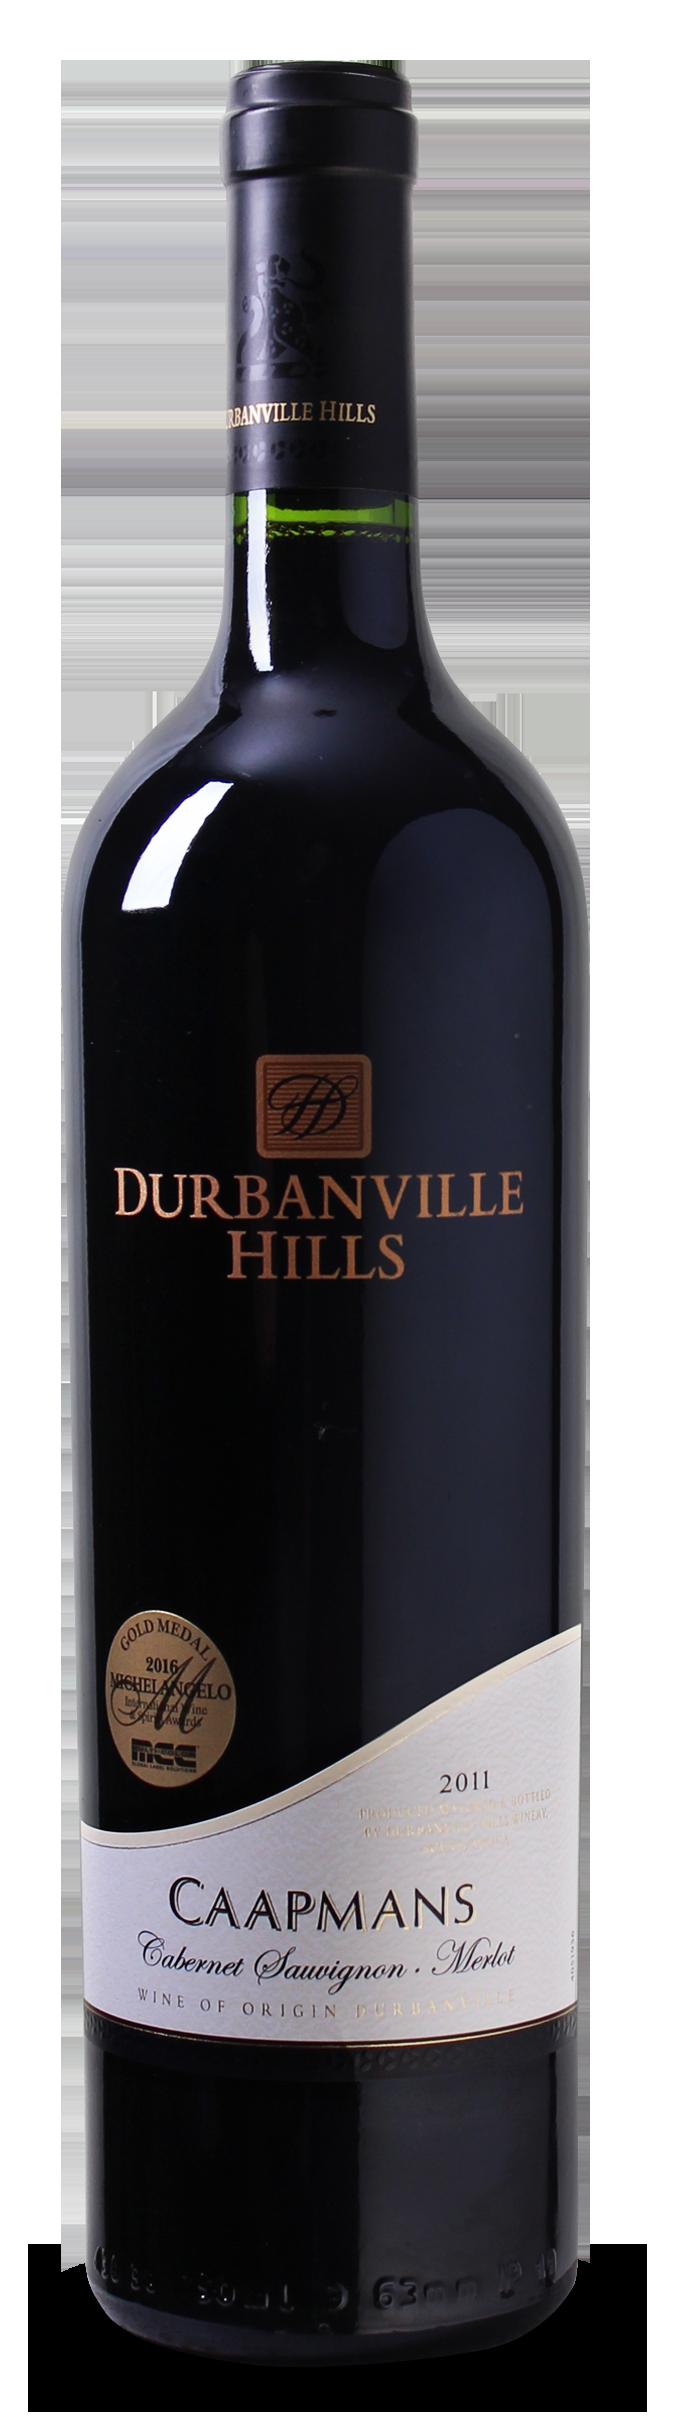 Durbanville Hills Caapmans Cabernet Sauvignon-Merlot WO Durbanville